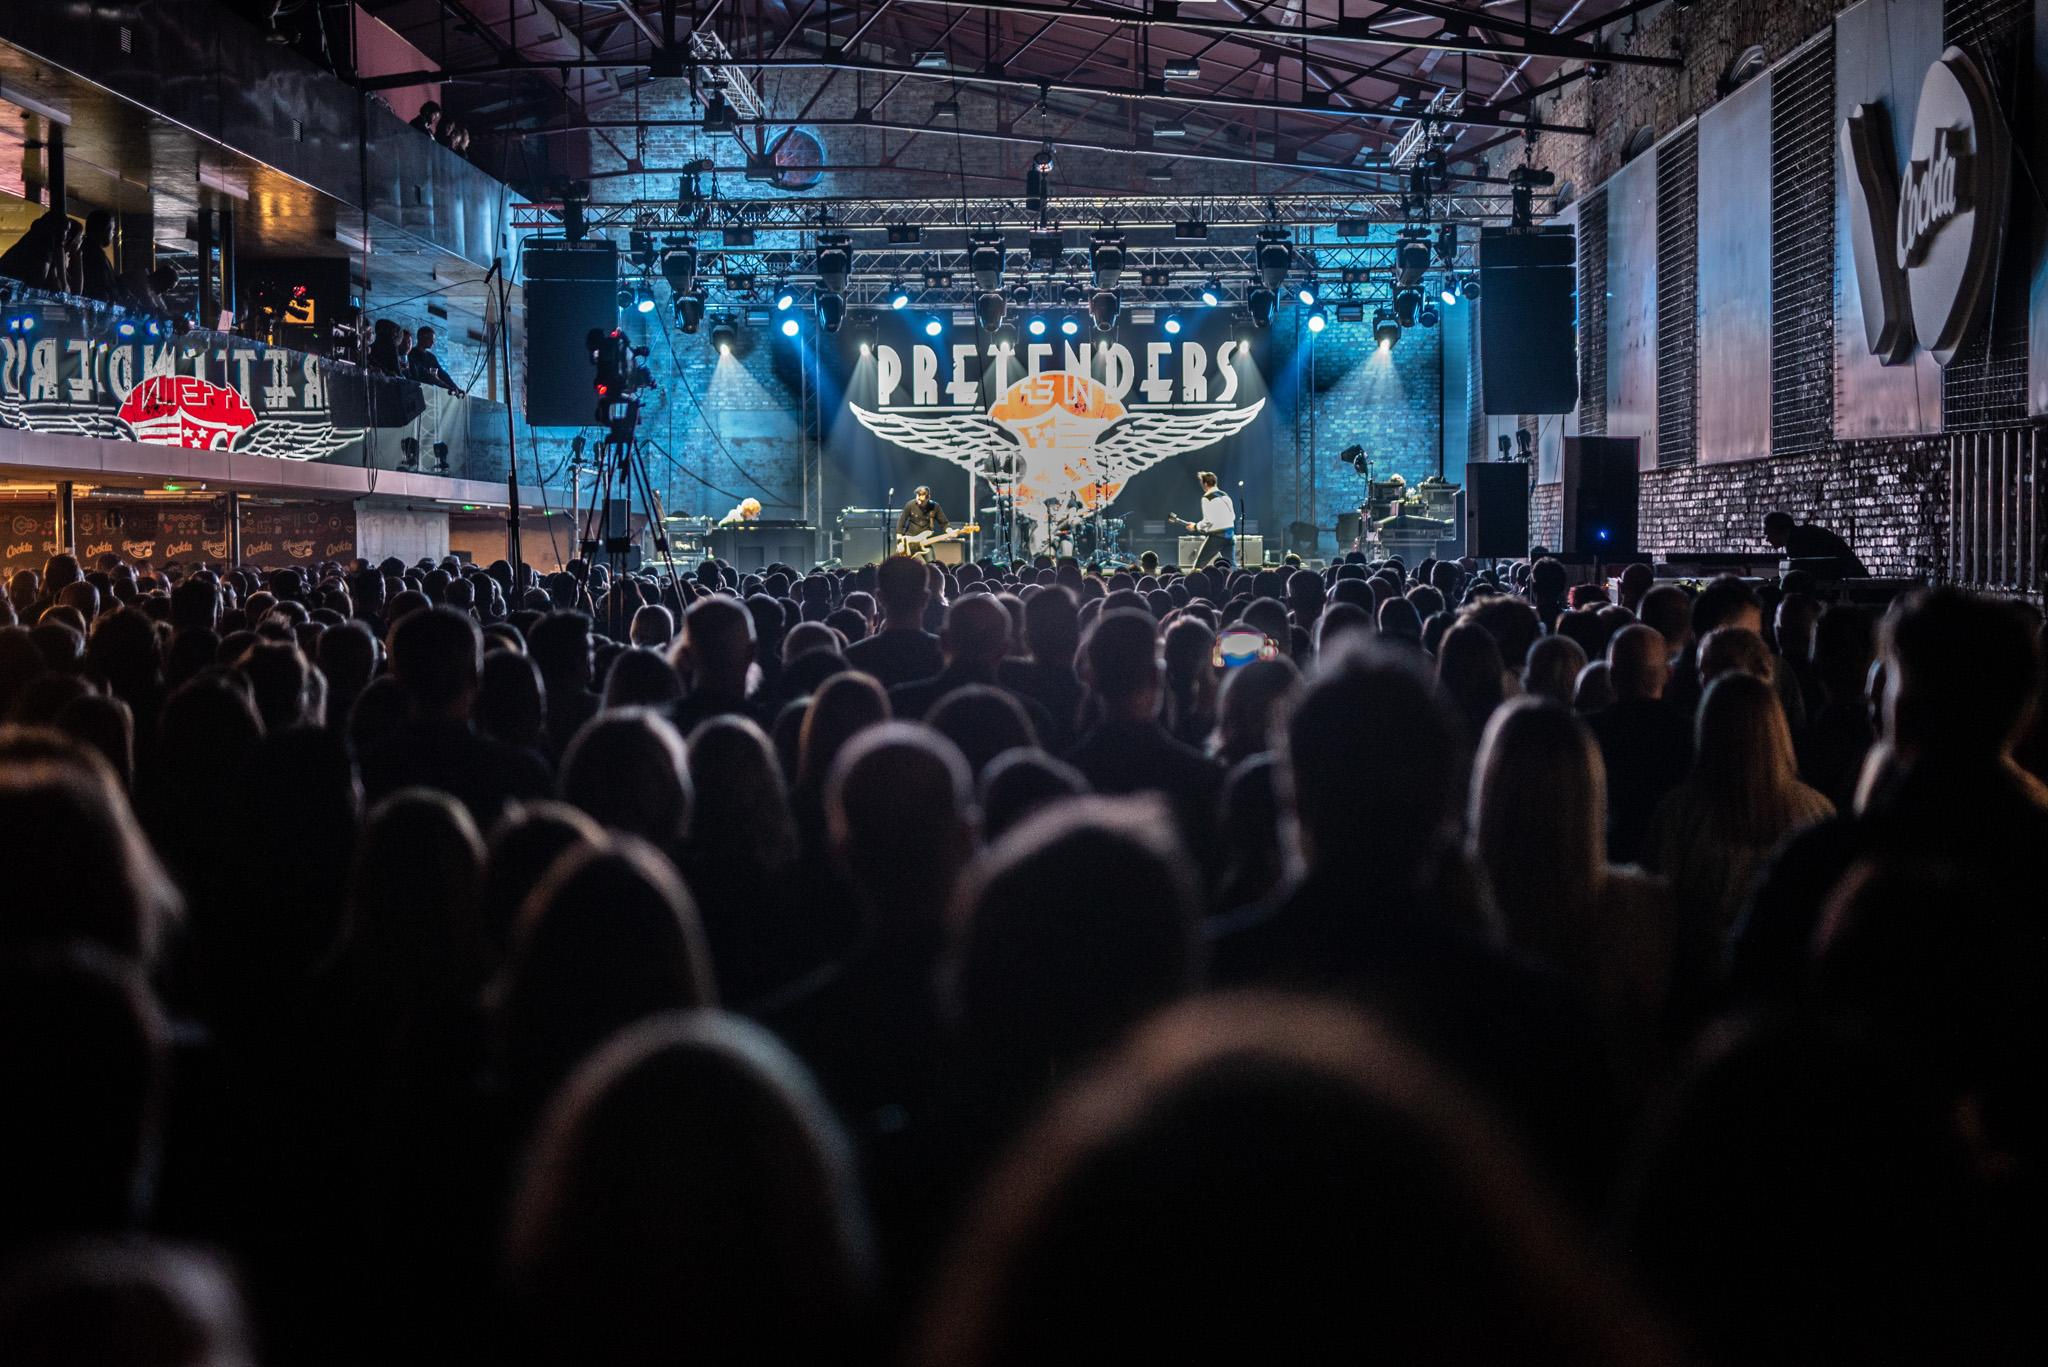 Yammatovo: Pretenders u Laubi / Foto Vedran Metelko i Niko Goga